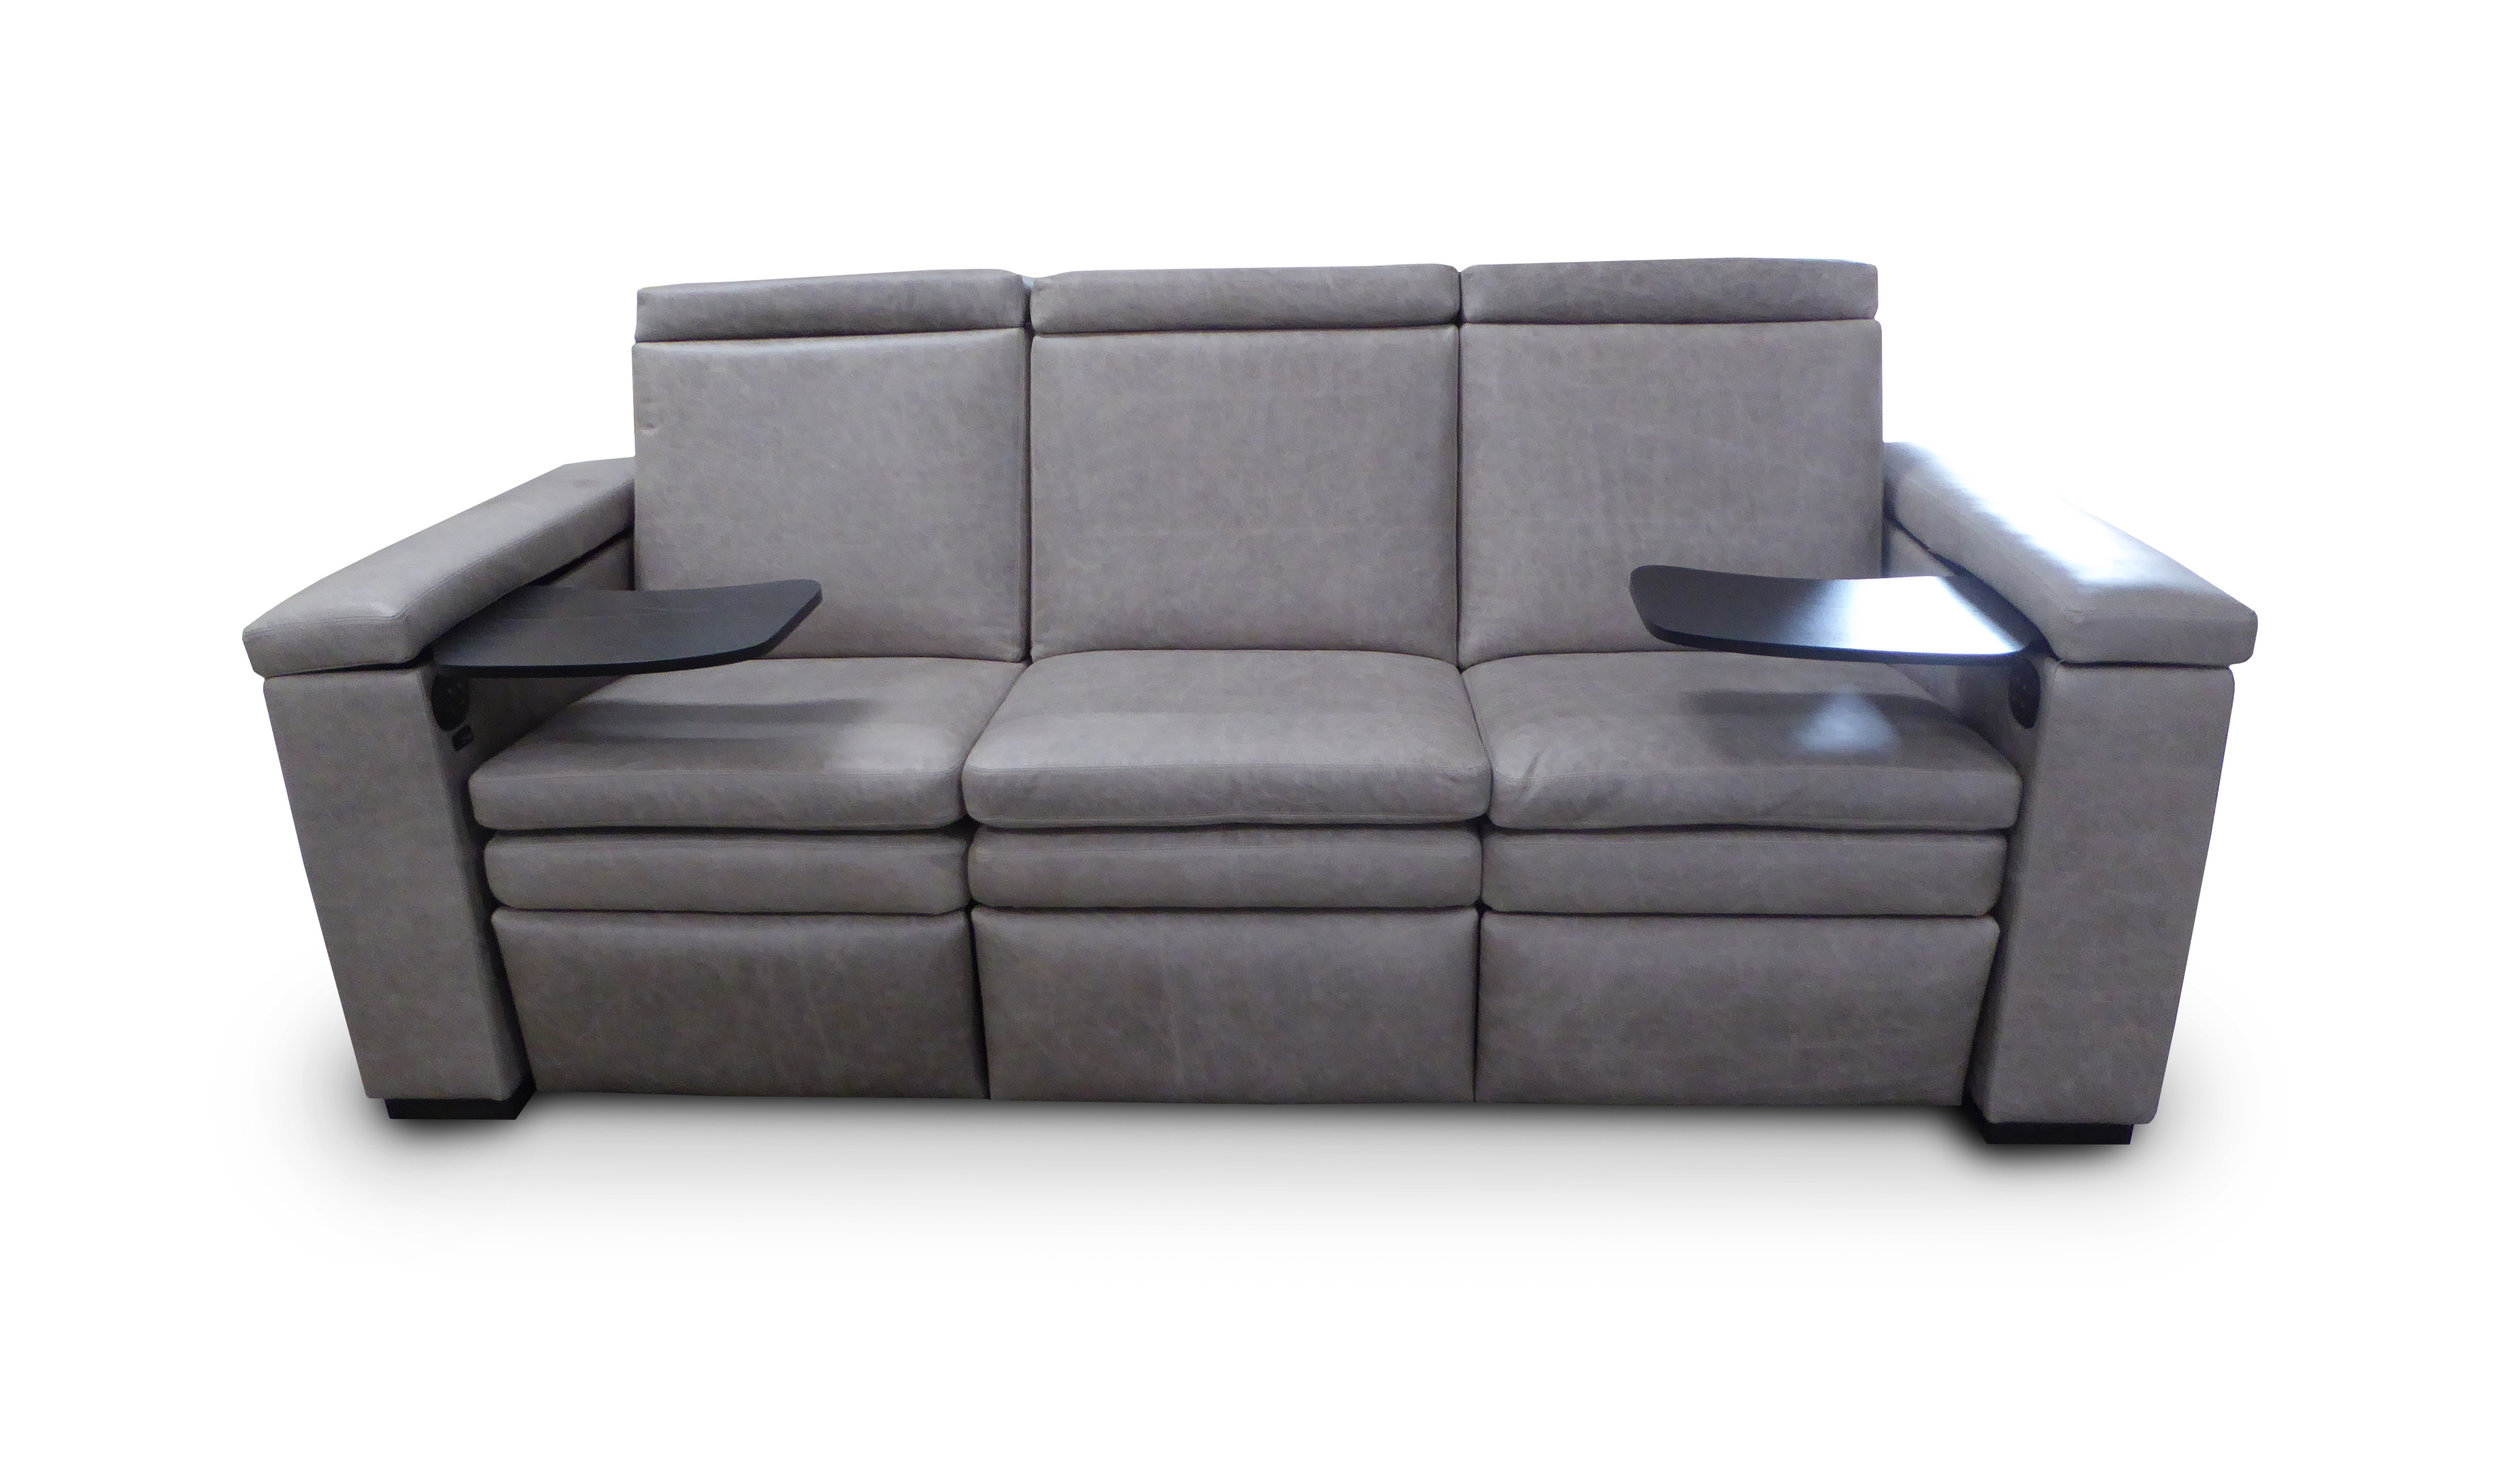 Dakota Reclining Sofa;  First Class Tray Tables; Motorized Adjustable Headrests